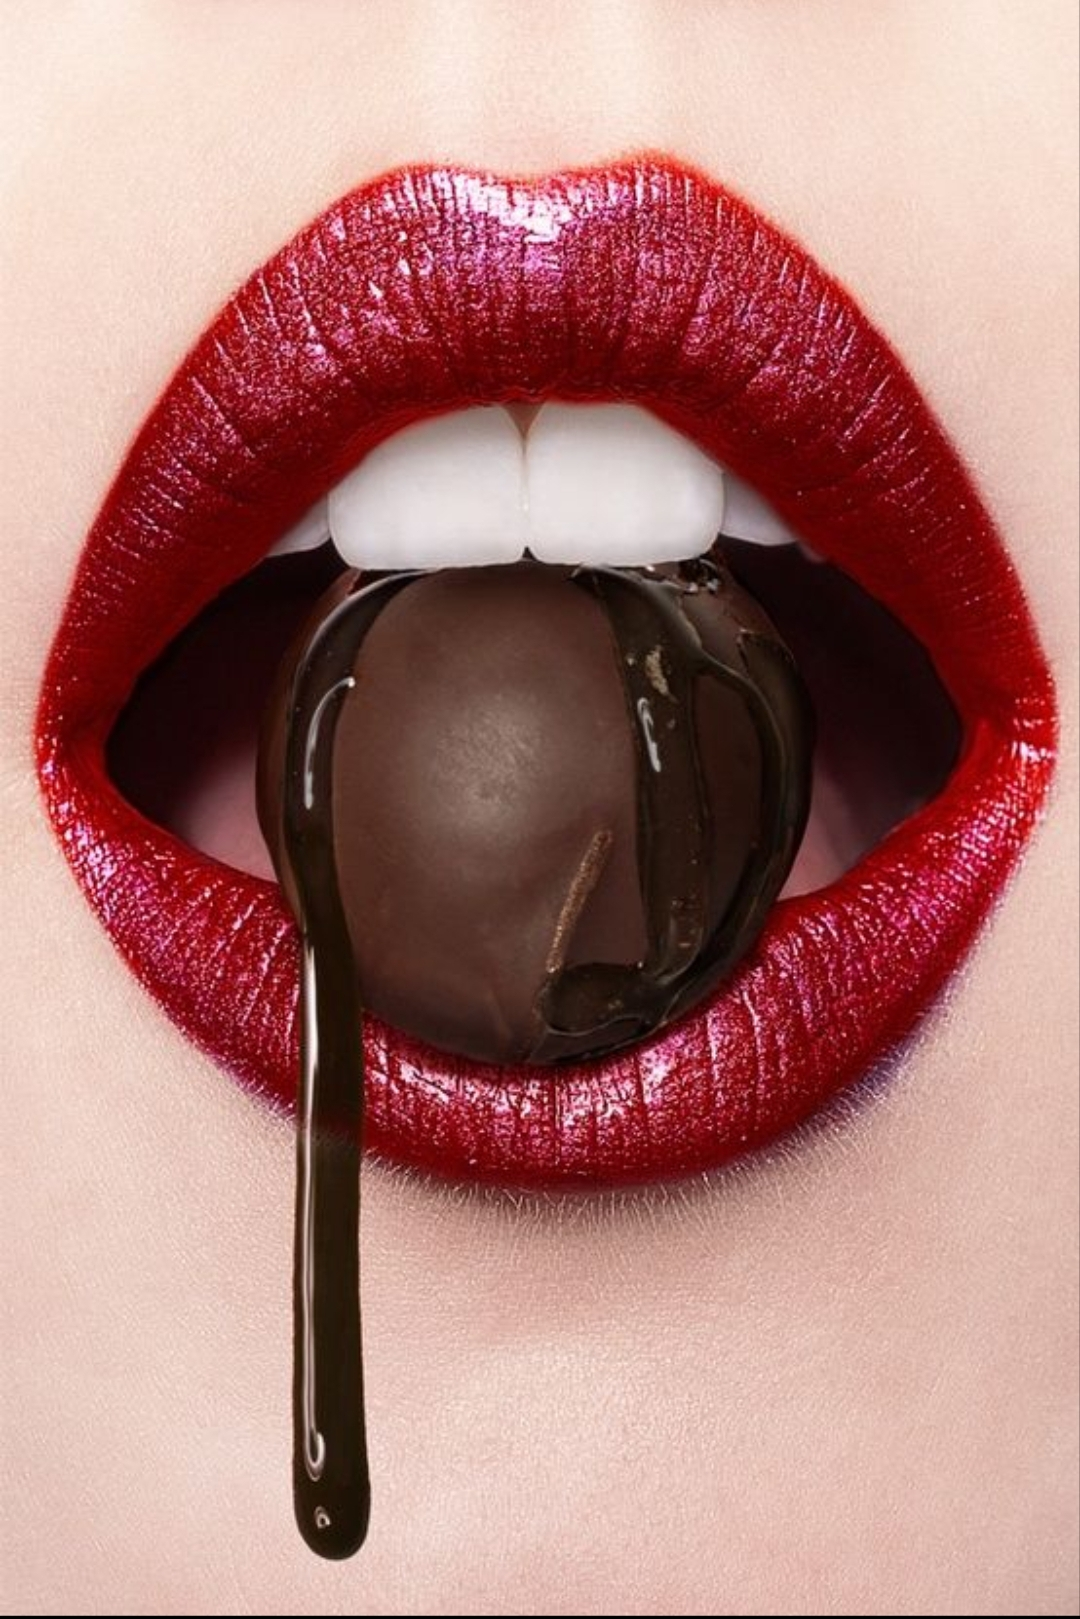 Choco-lips-033045